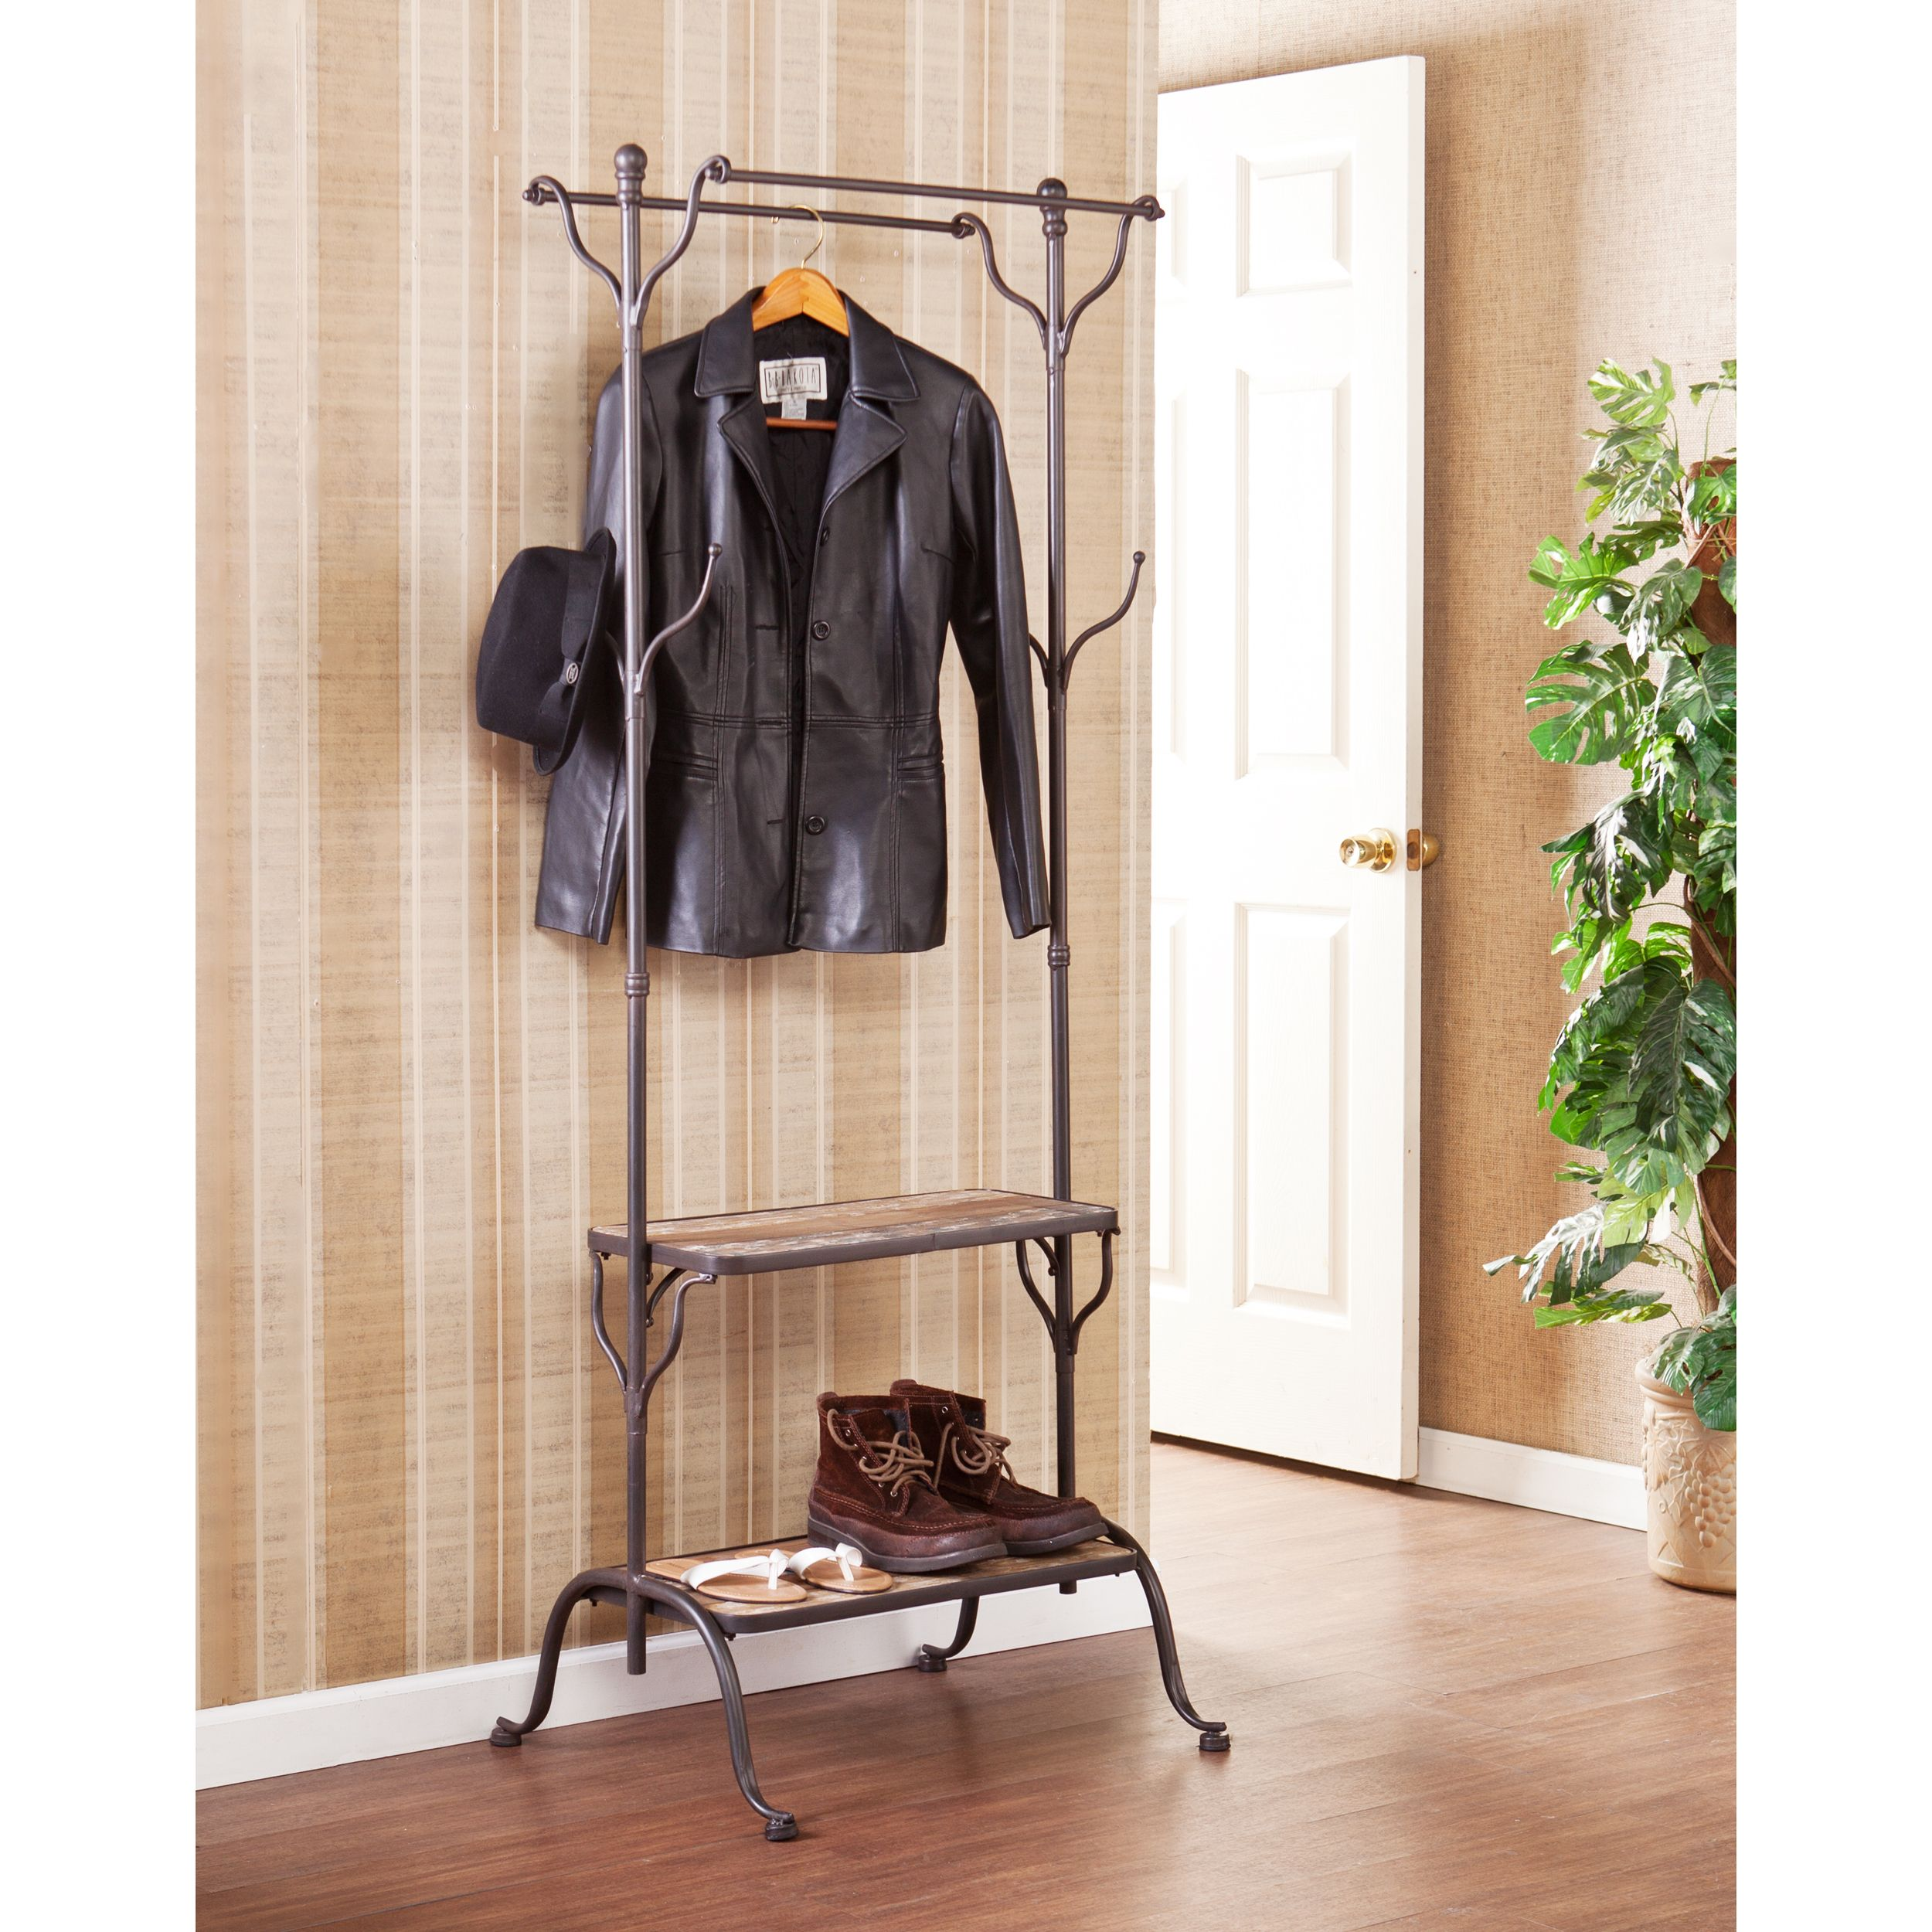 The Rustic Upton Home Ashbury Entryway Shelf Hall Coat Rack